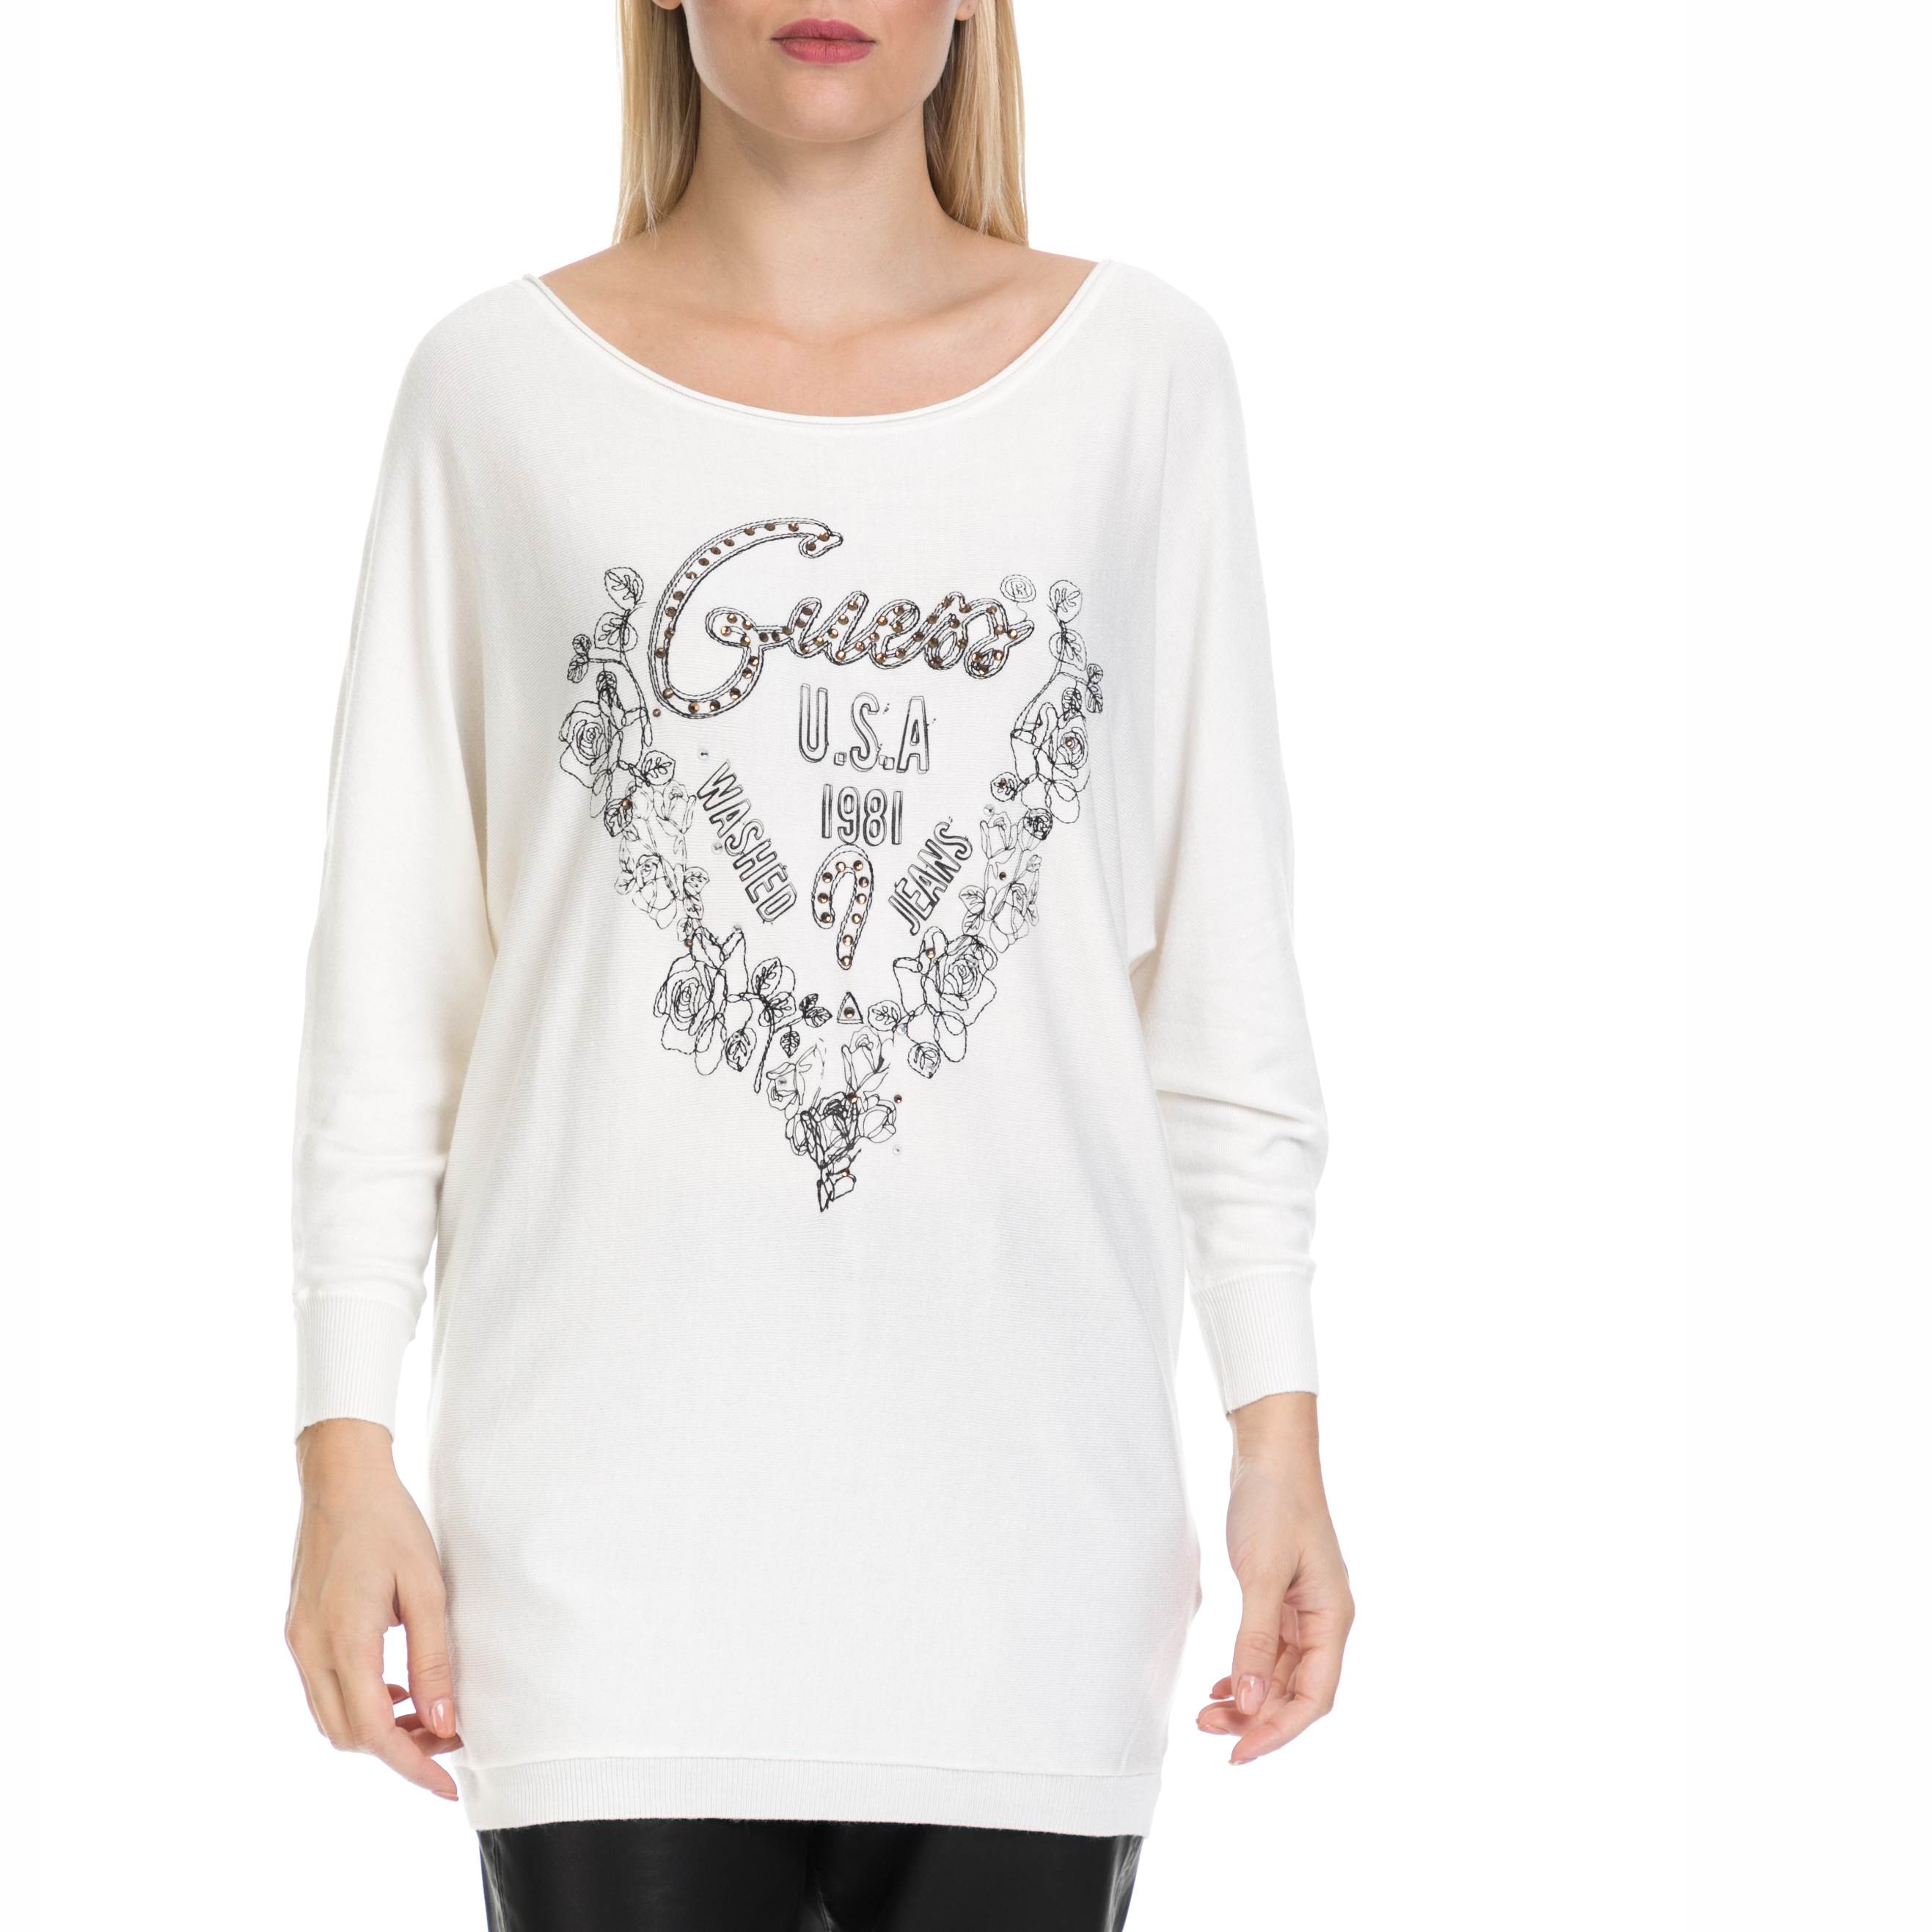 84a014f4eebf GUESS - Γυναικεία μπλούζα LEA GUESS λευκή ⋆ egynaika.gr